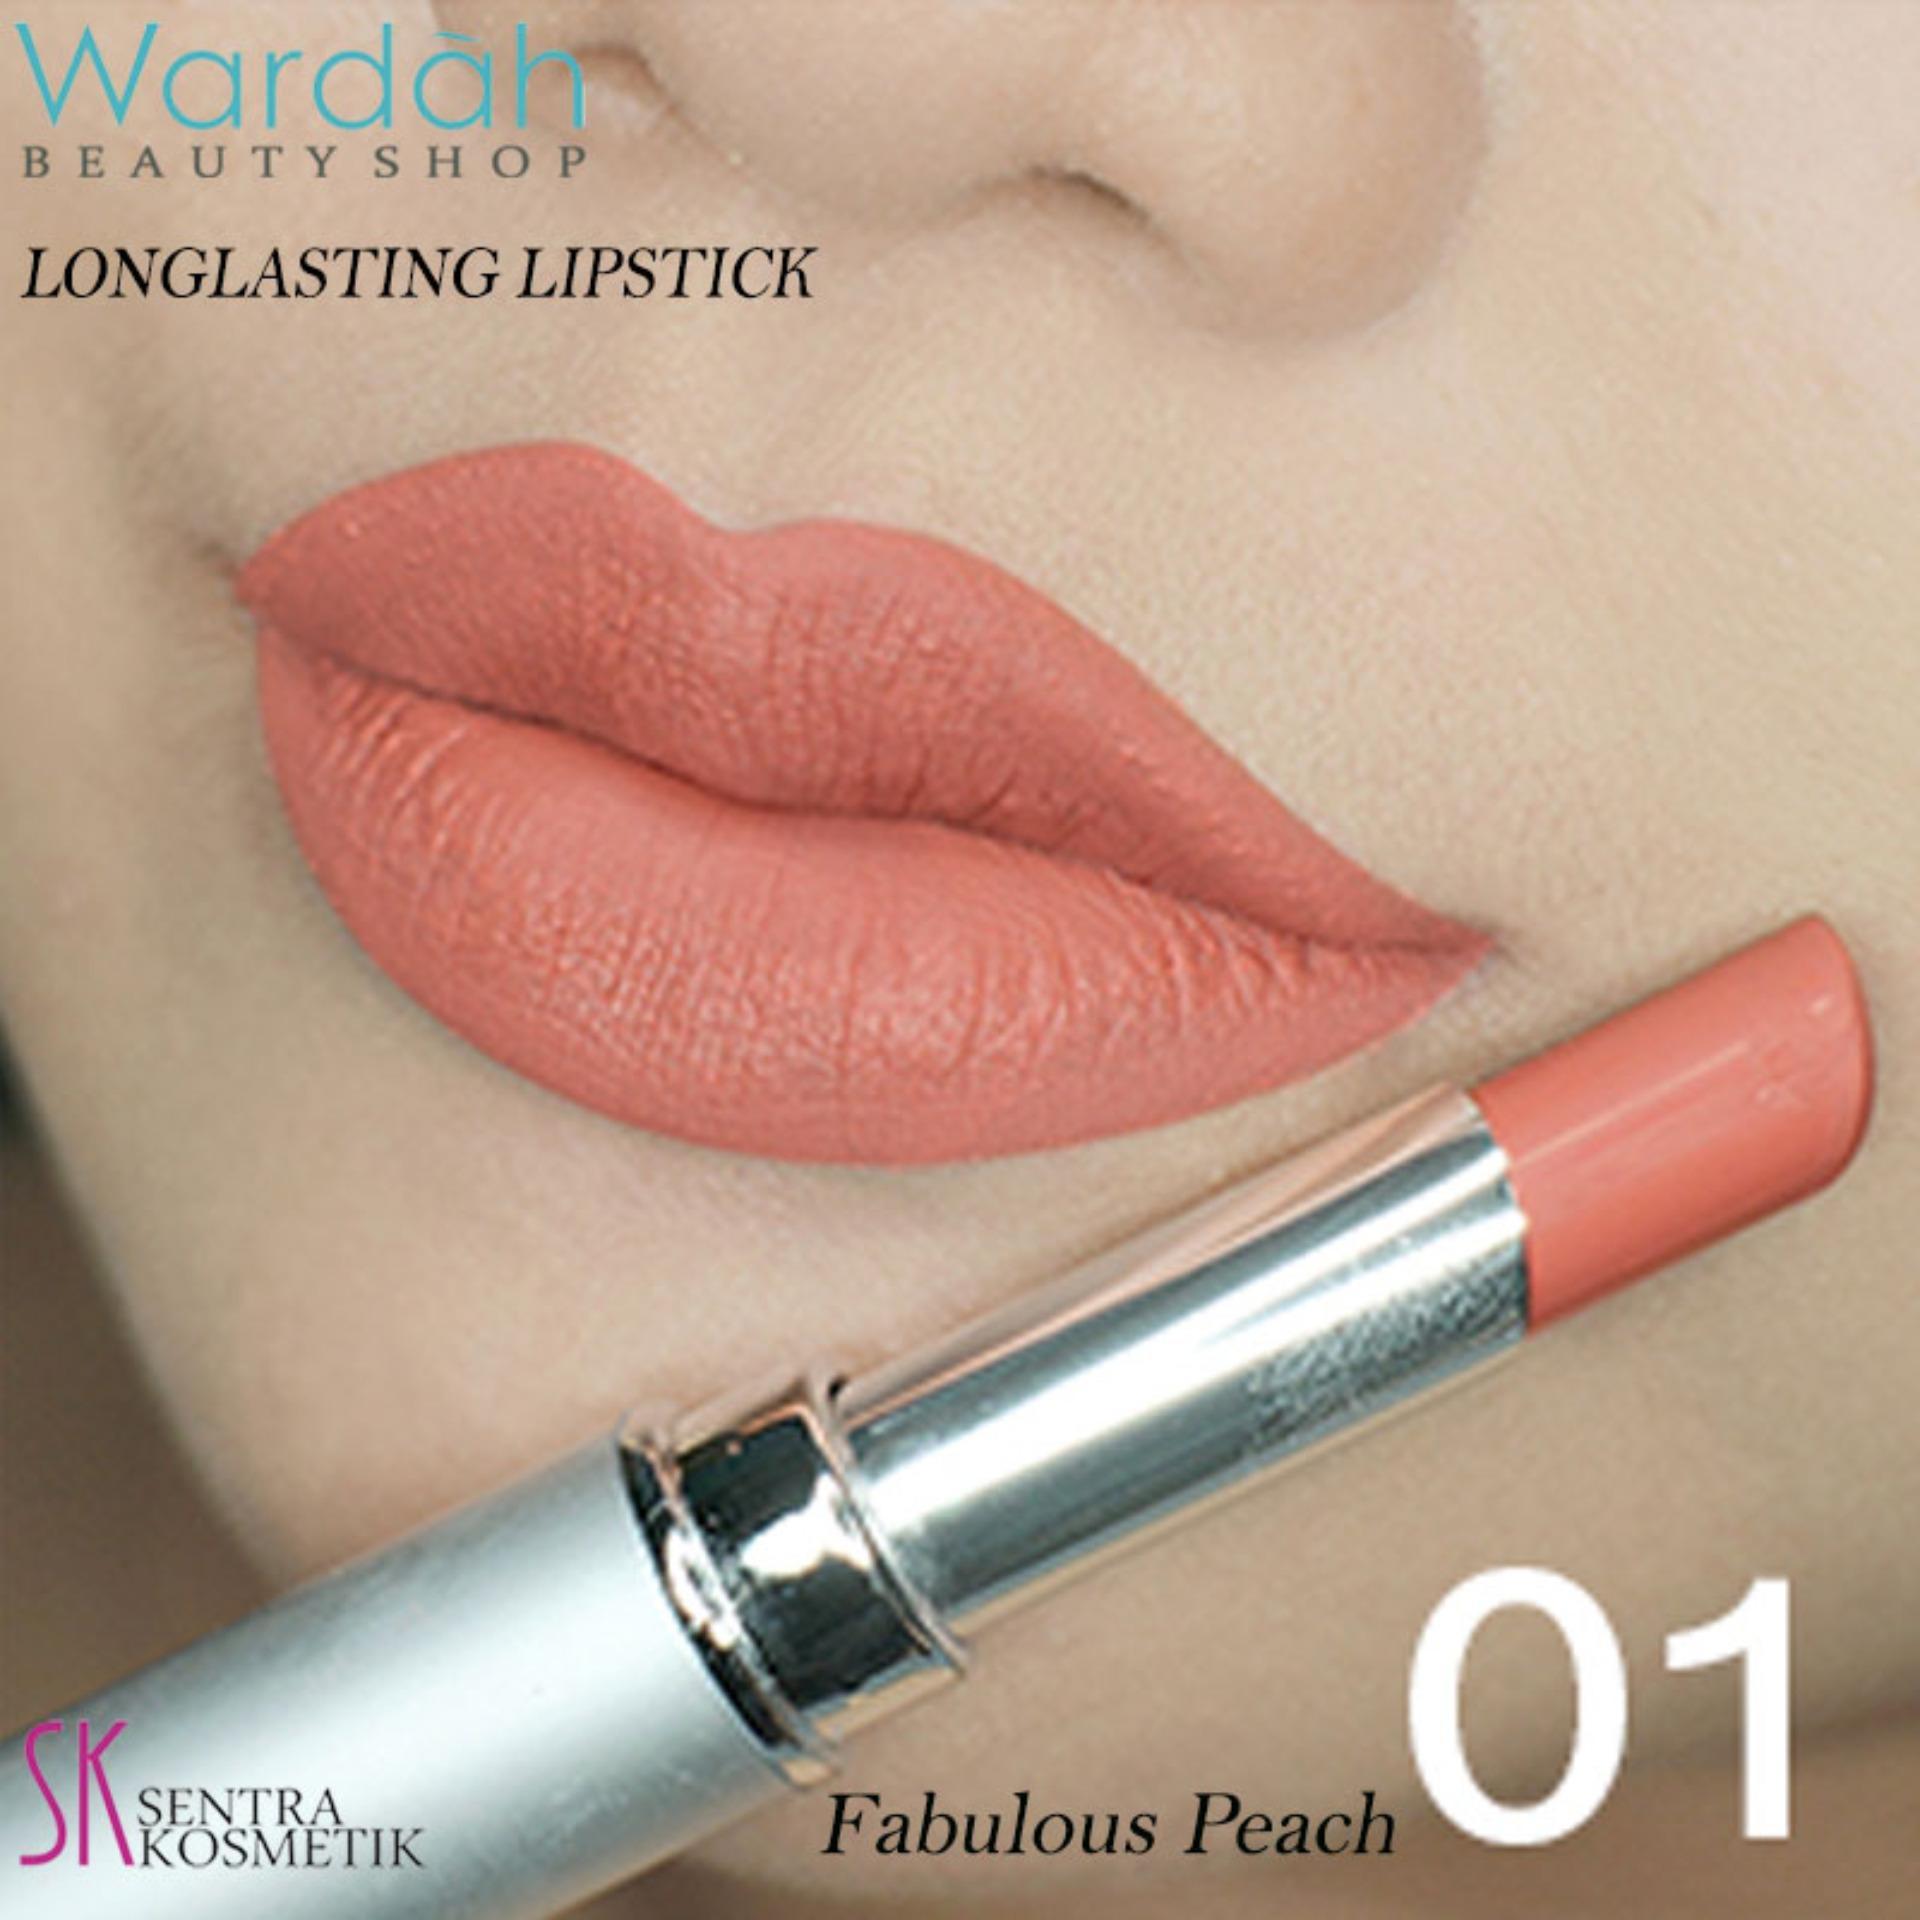 Wardah LONGLASTING Lipstick No 01 Fabulous Peach